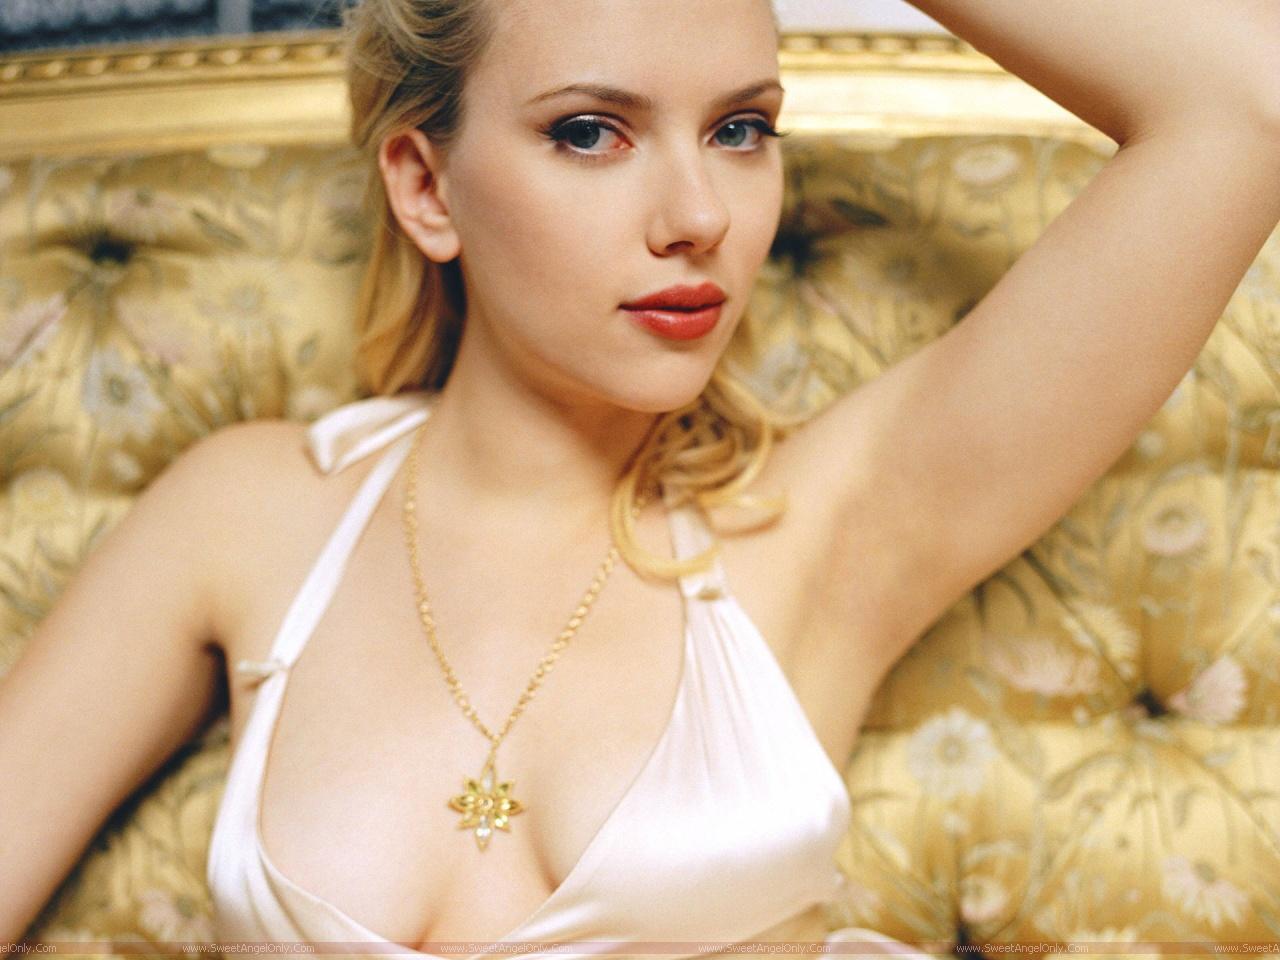 http://4.bp.blogspot.com/-ADyhIs2b2ow/ThRgBbFIQmI/AAAAAAAAHgg/efSD3yEvMN0/s1600/Scarlett_Johansson_lips_calling_you.jpg